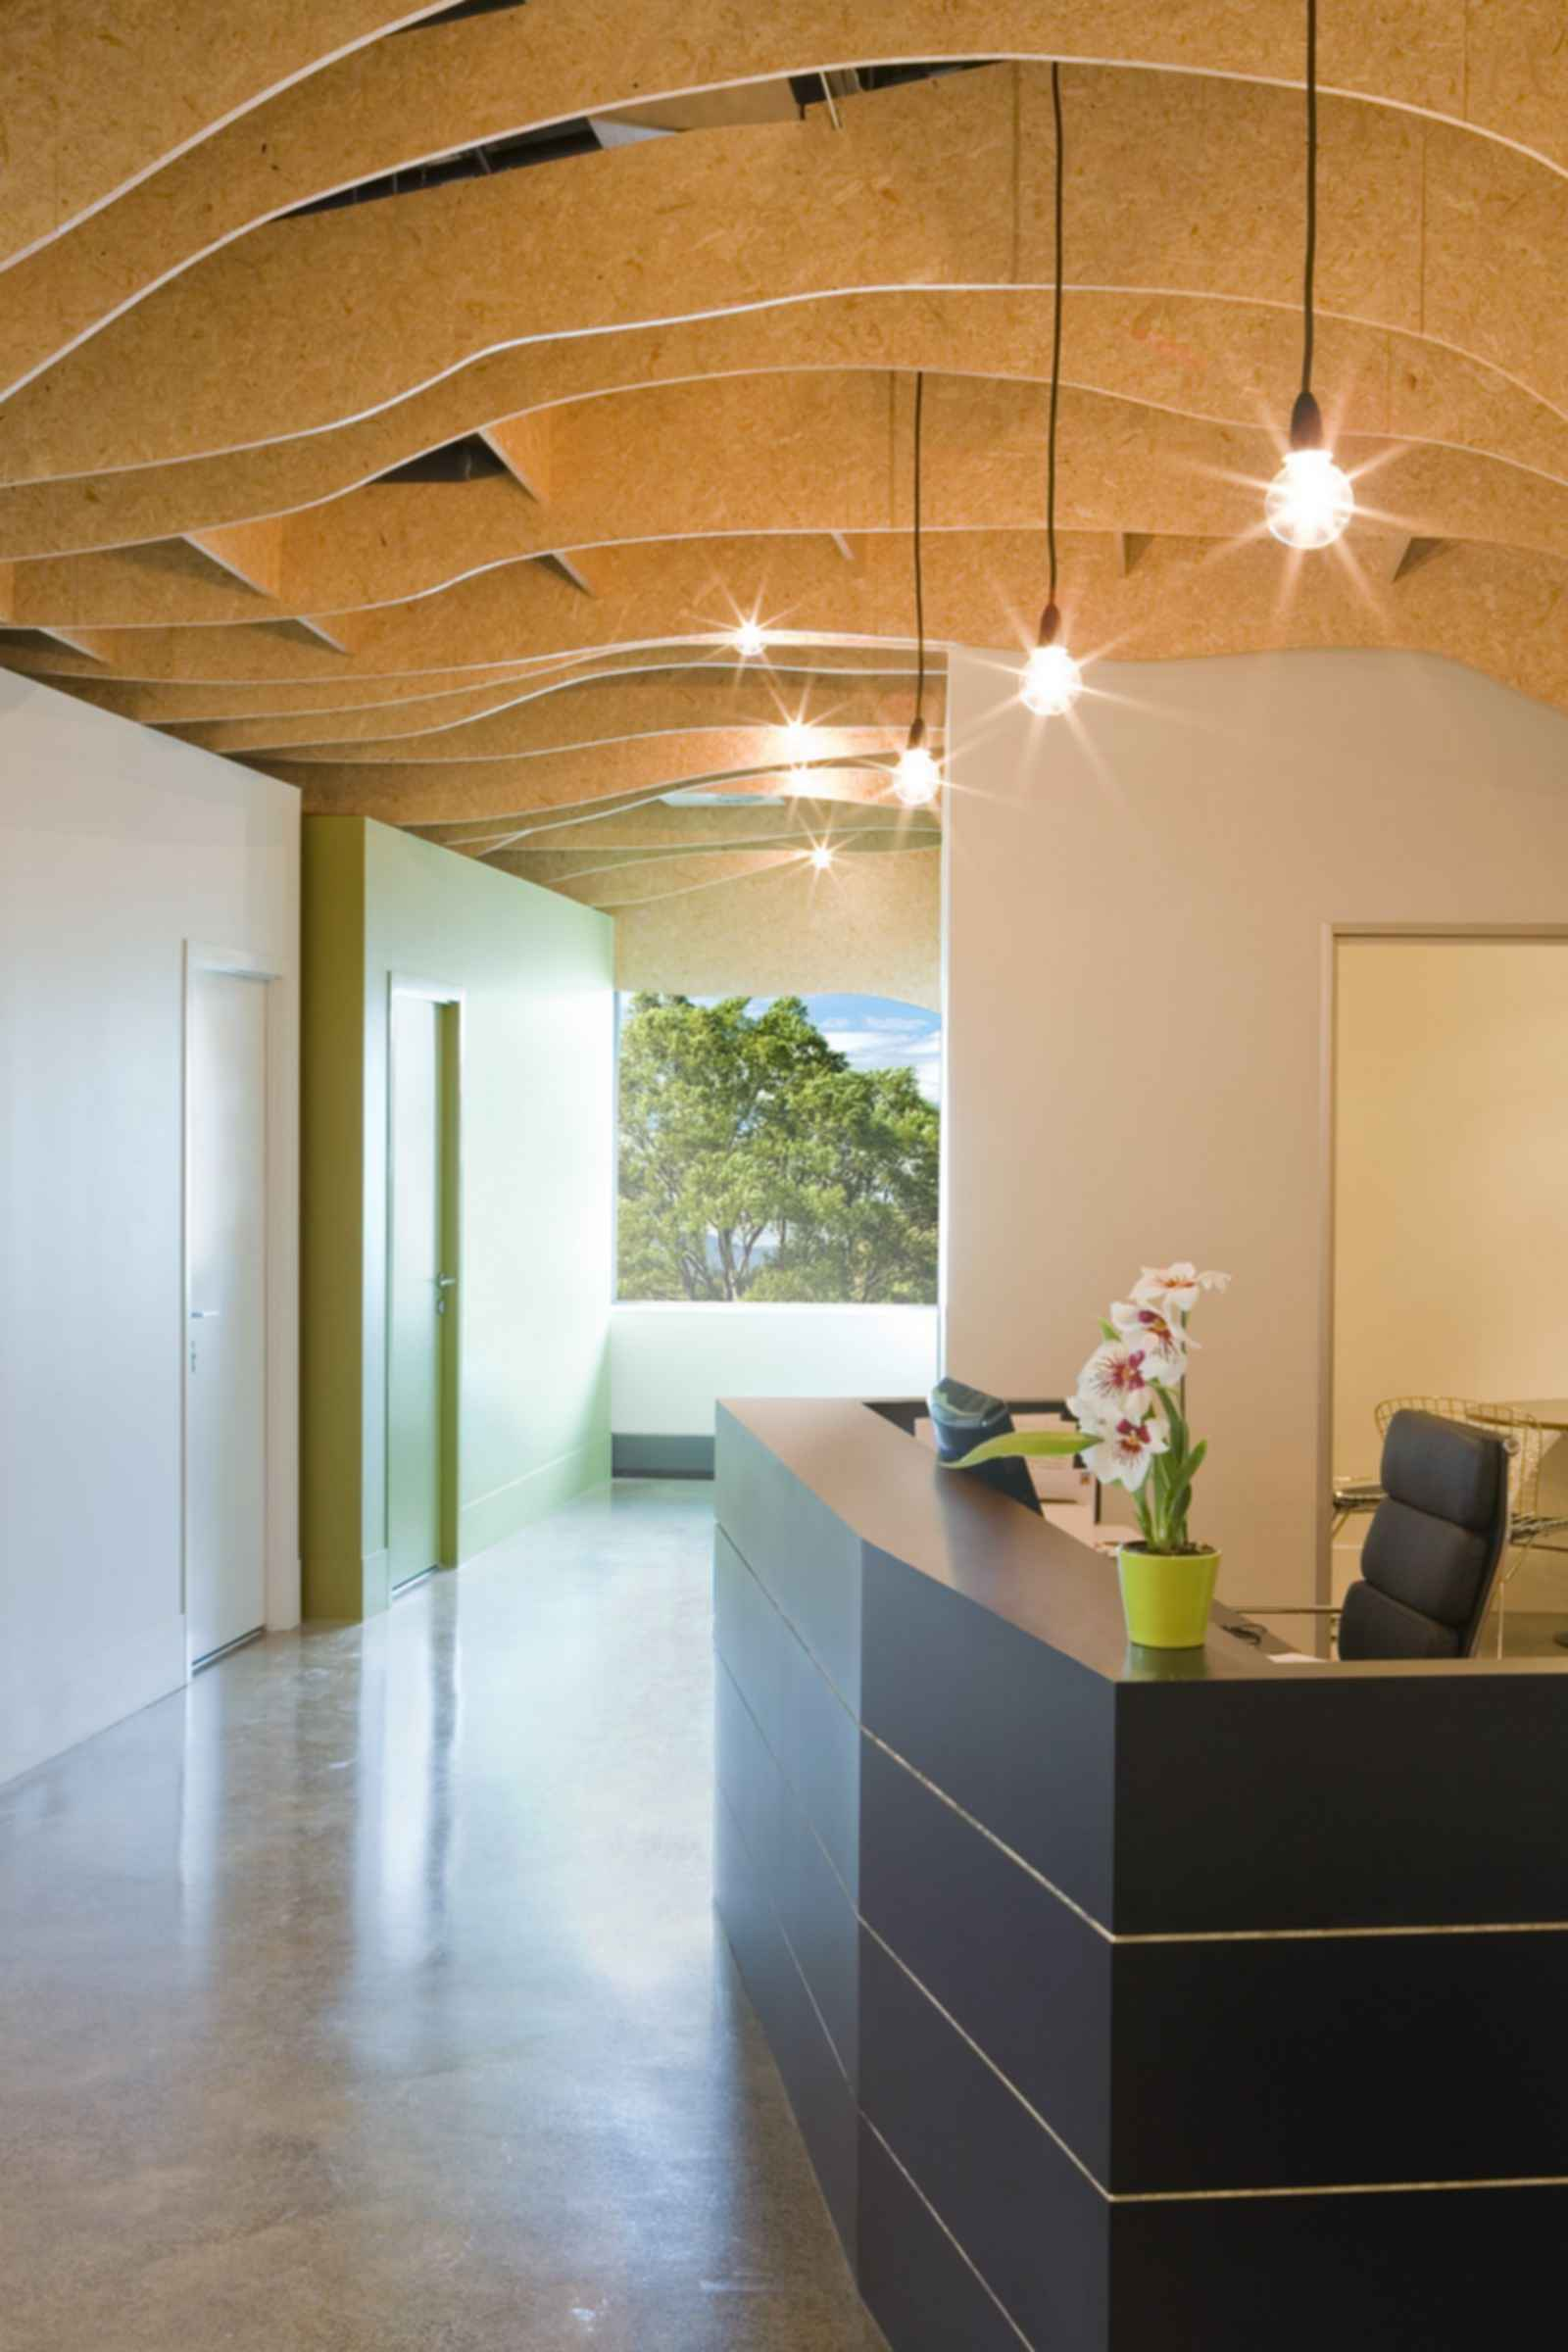 Clinic Interior - Reception